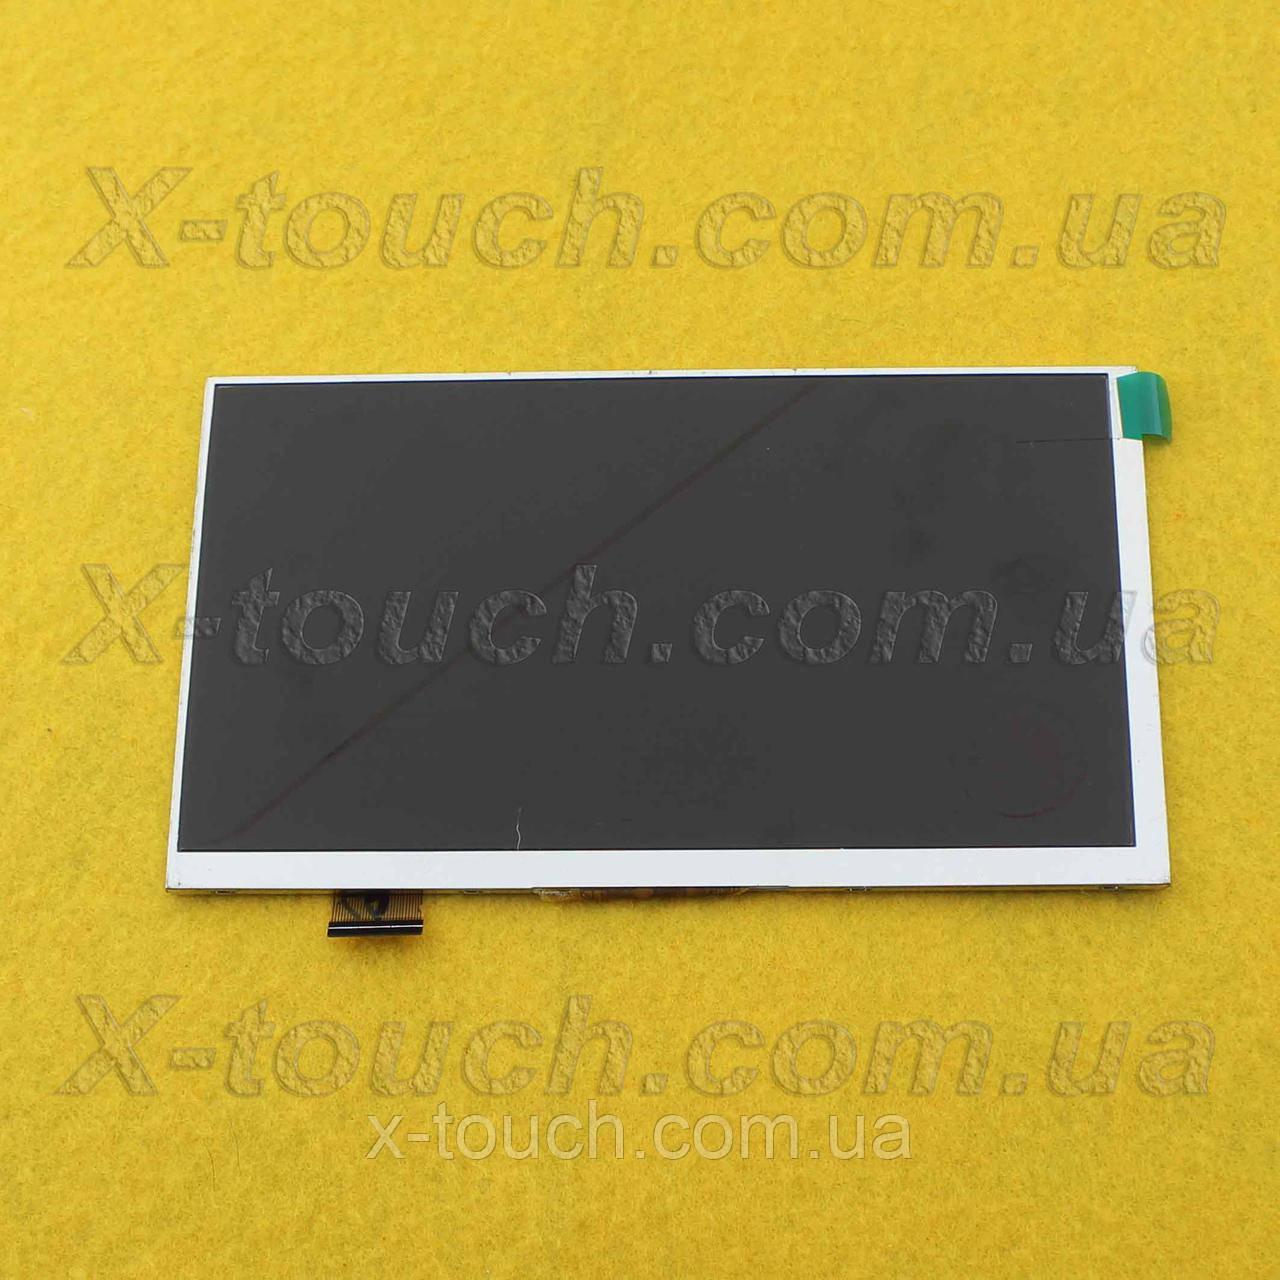 Матрица,экран, дисплей XYX-CPT70-30pin-010 для планшета